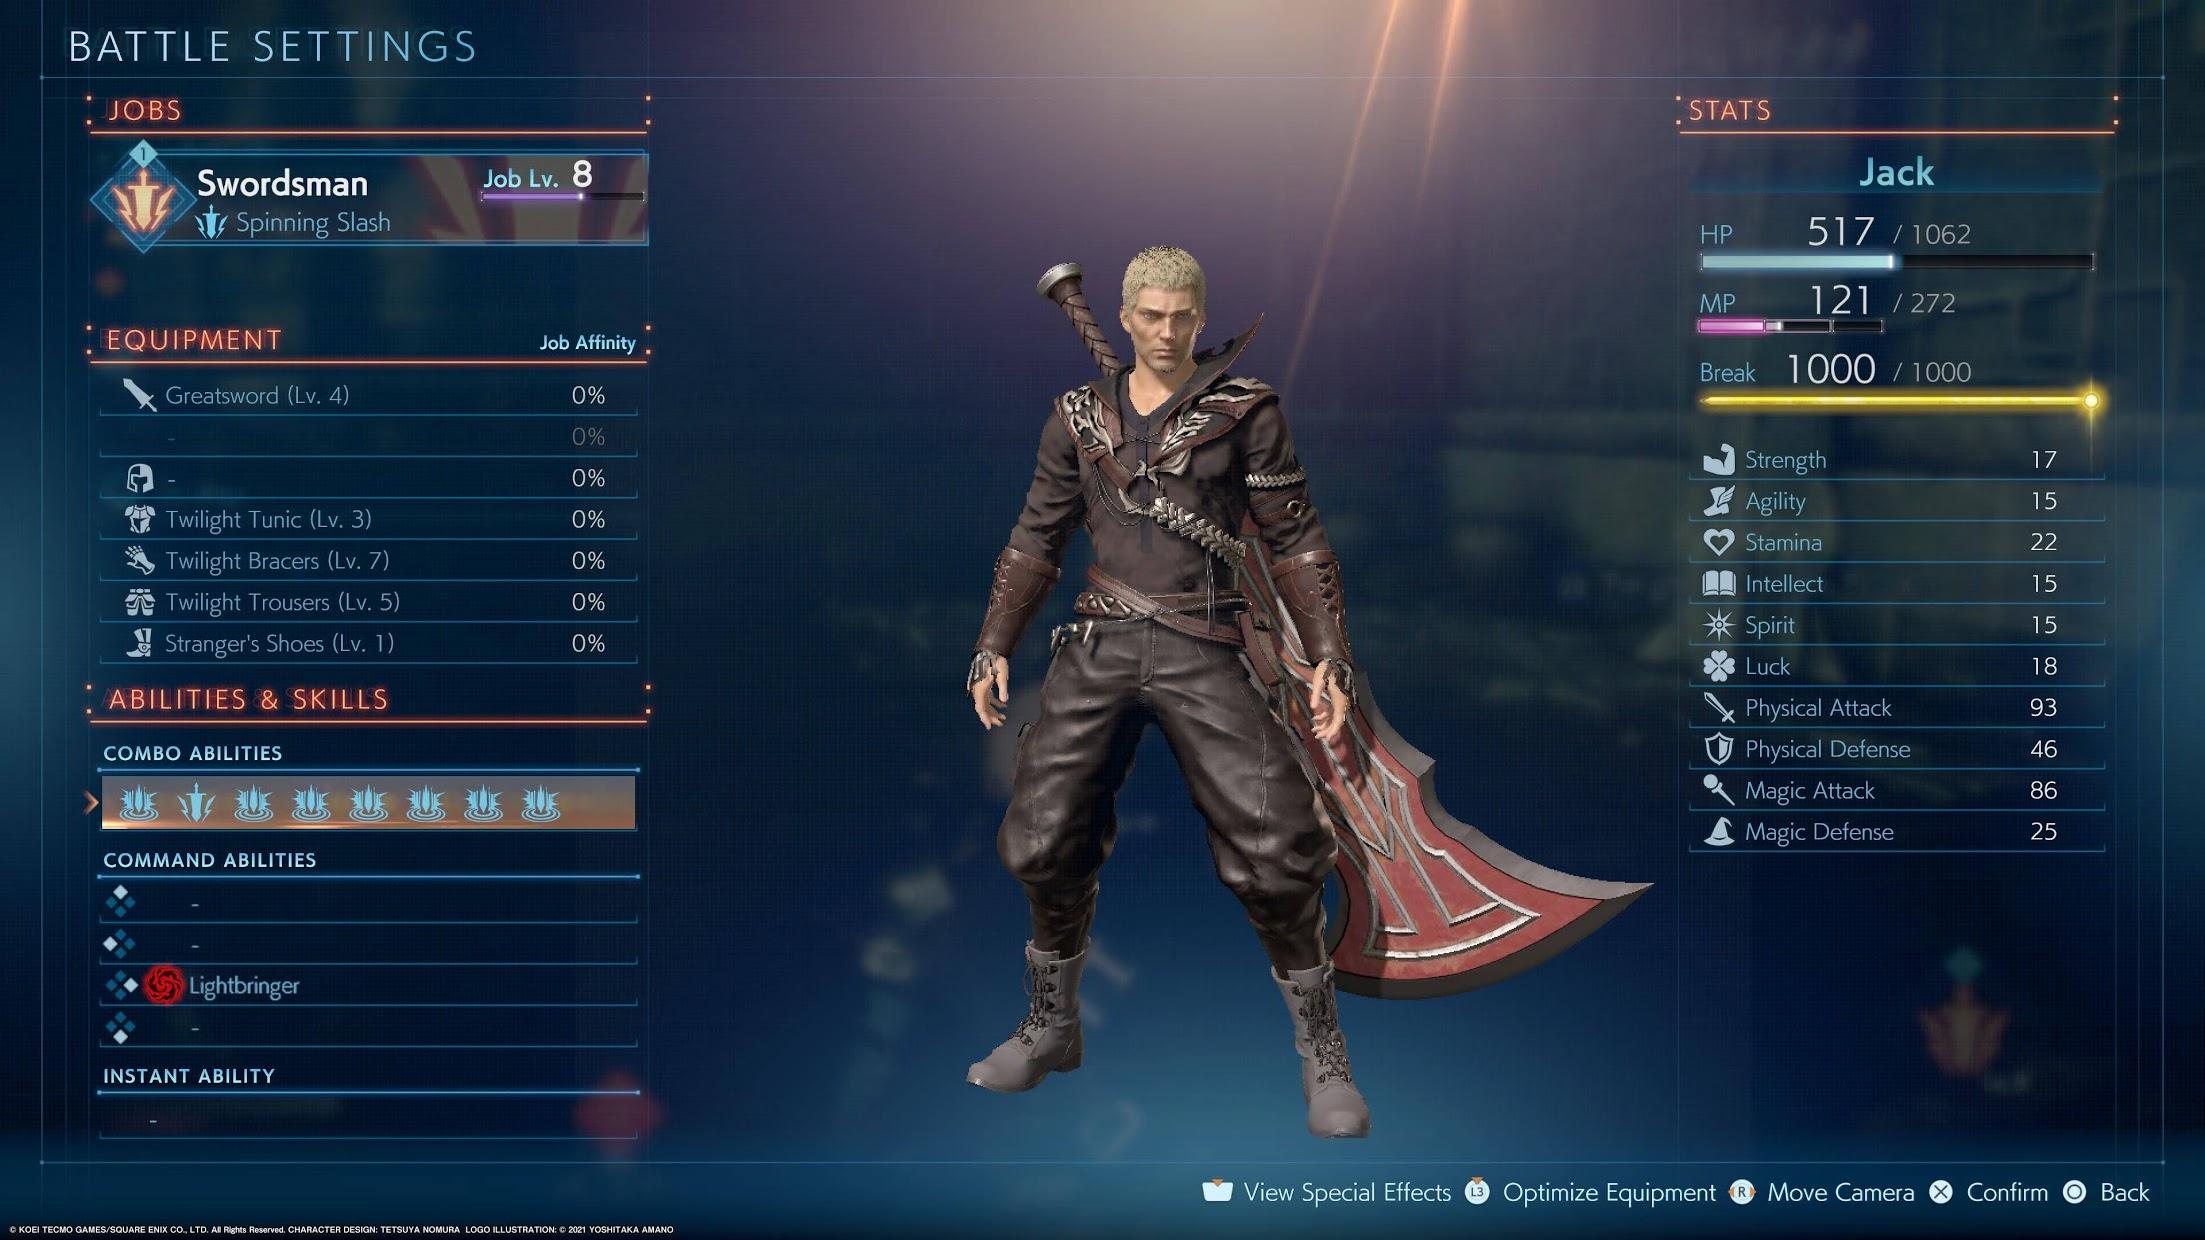 Final Fantasy Origin Battle Settings screen